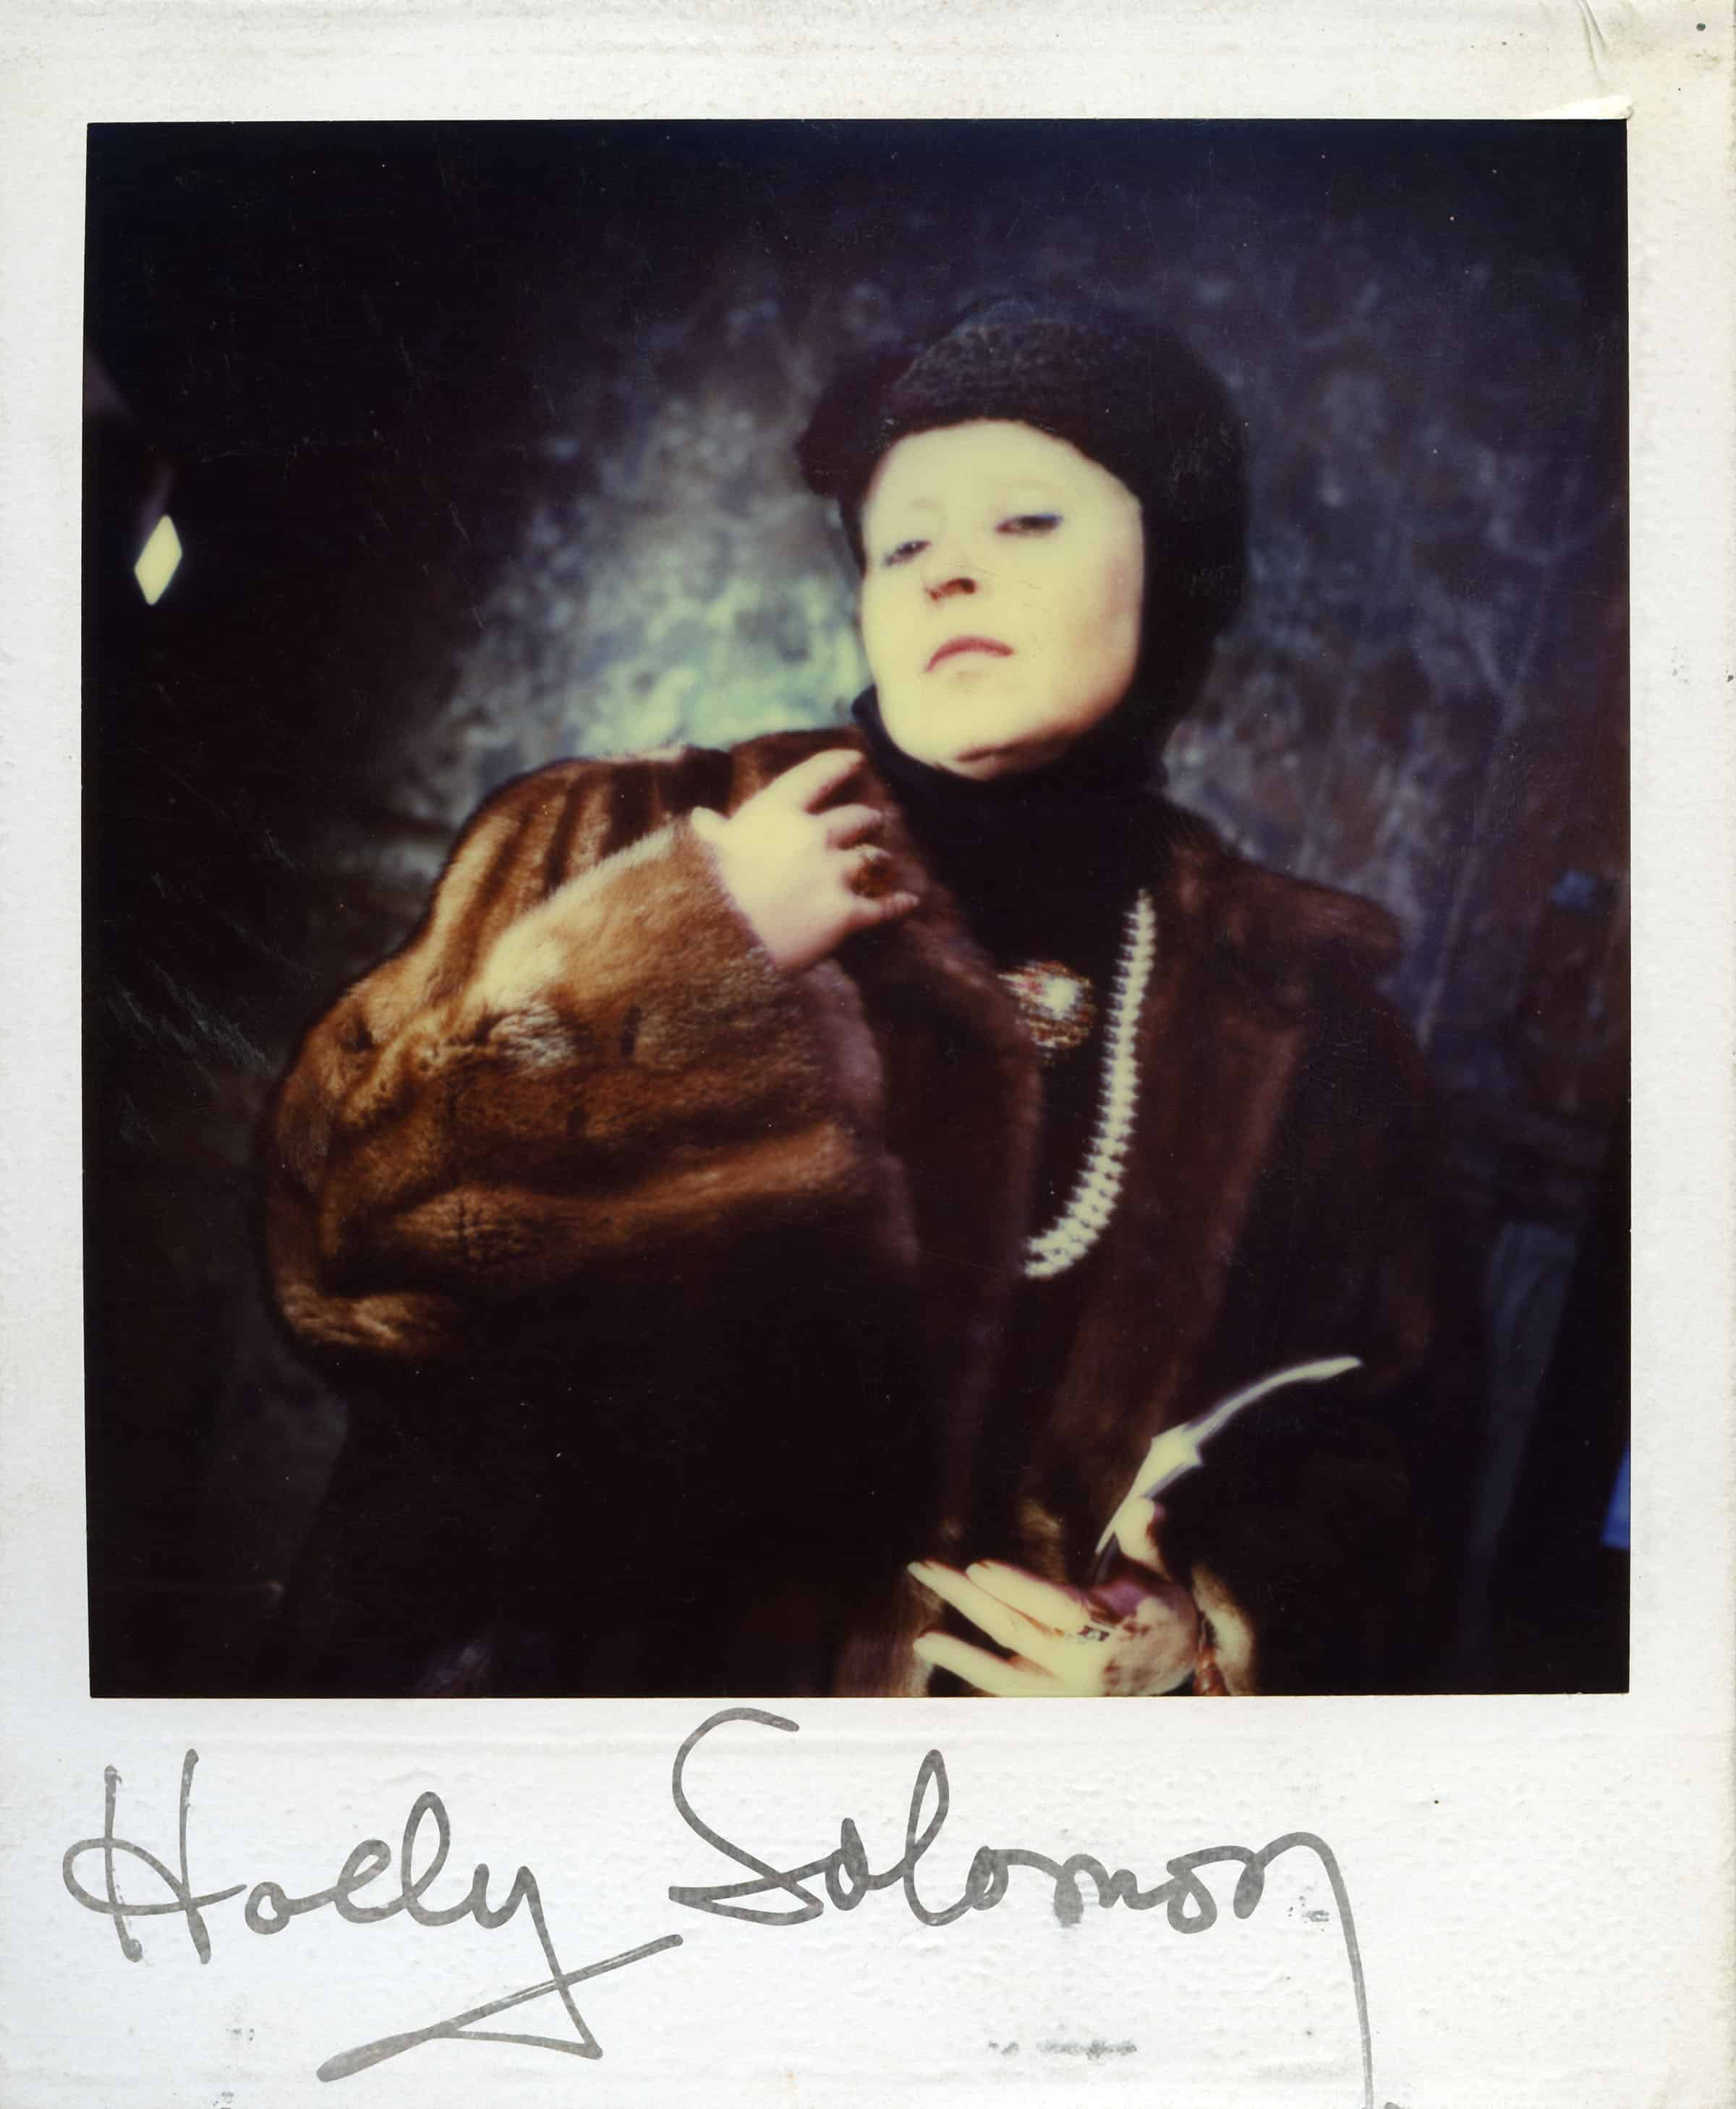 Holly Solomon polaroids_219 copy